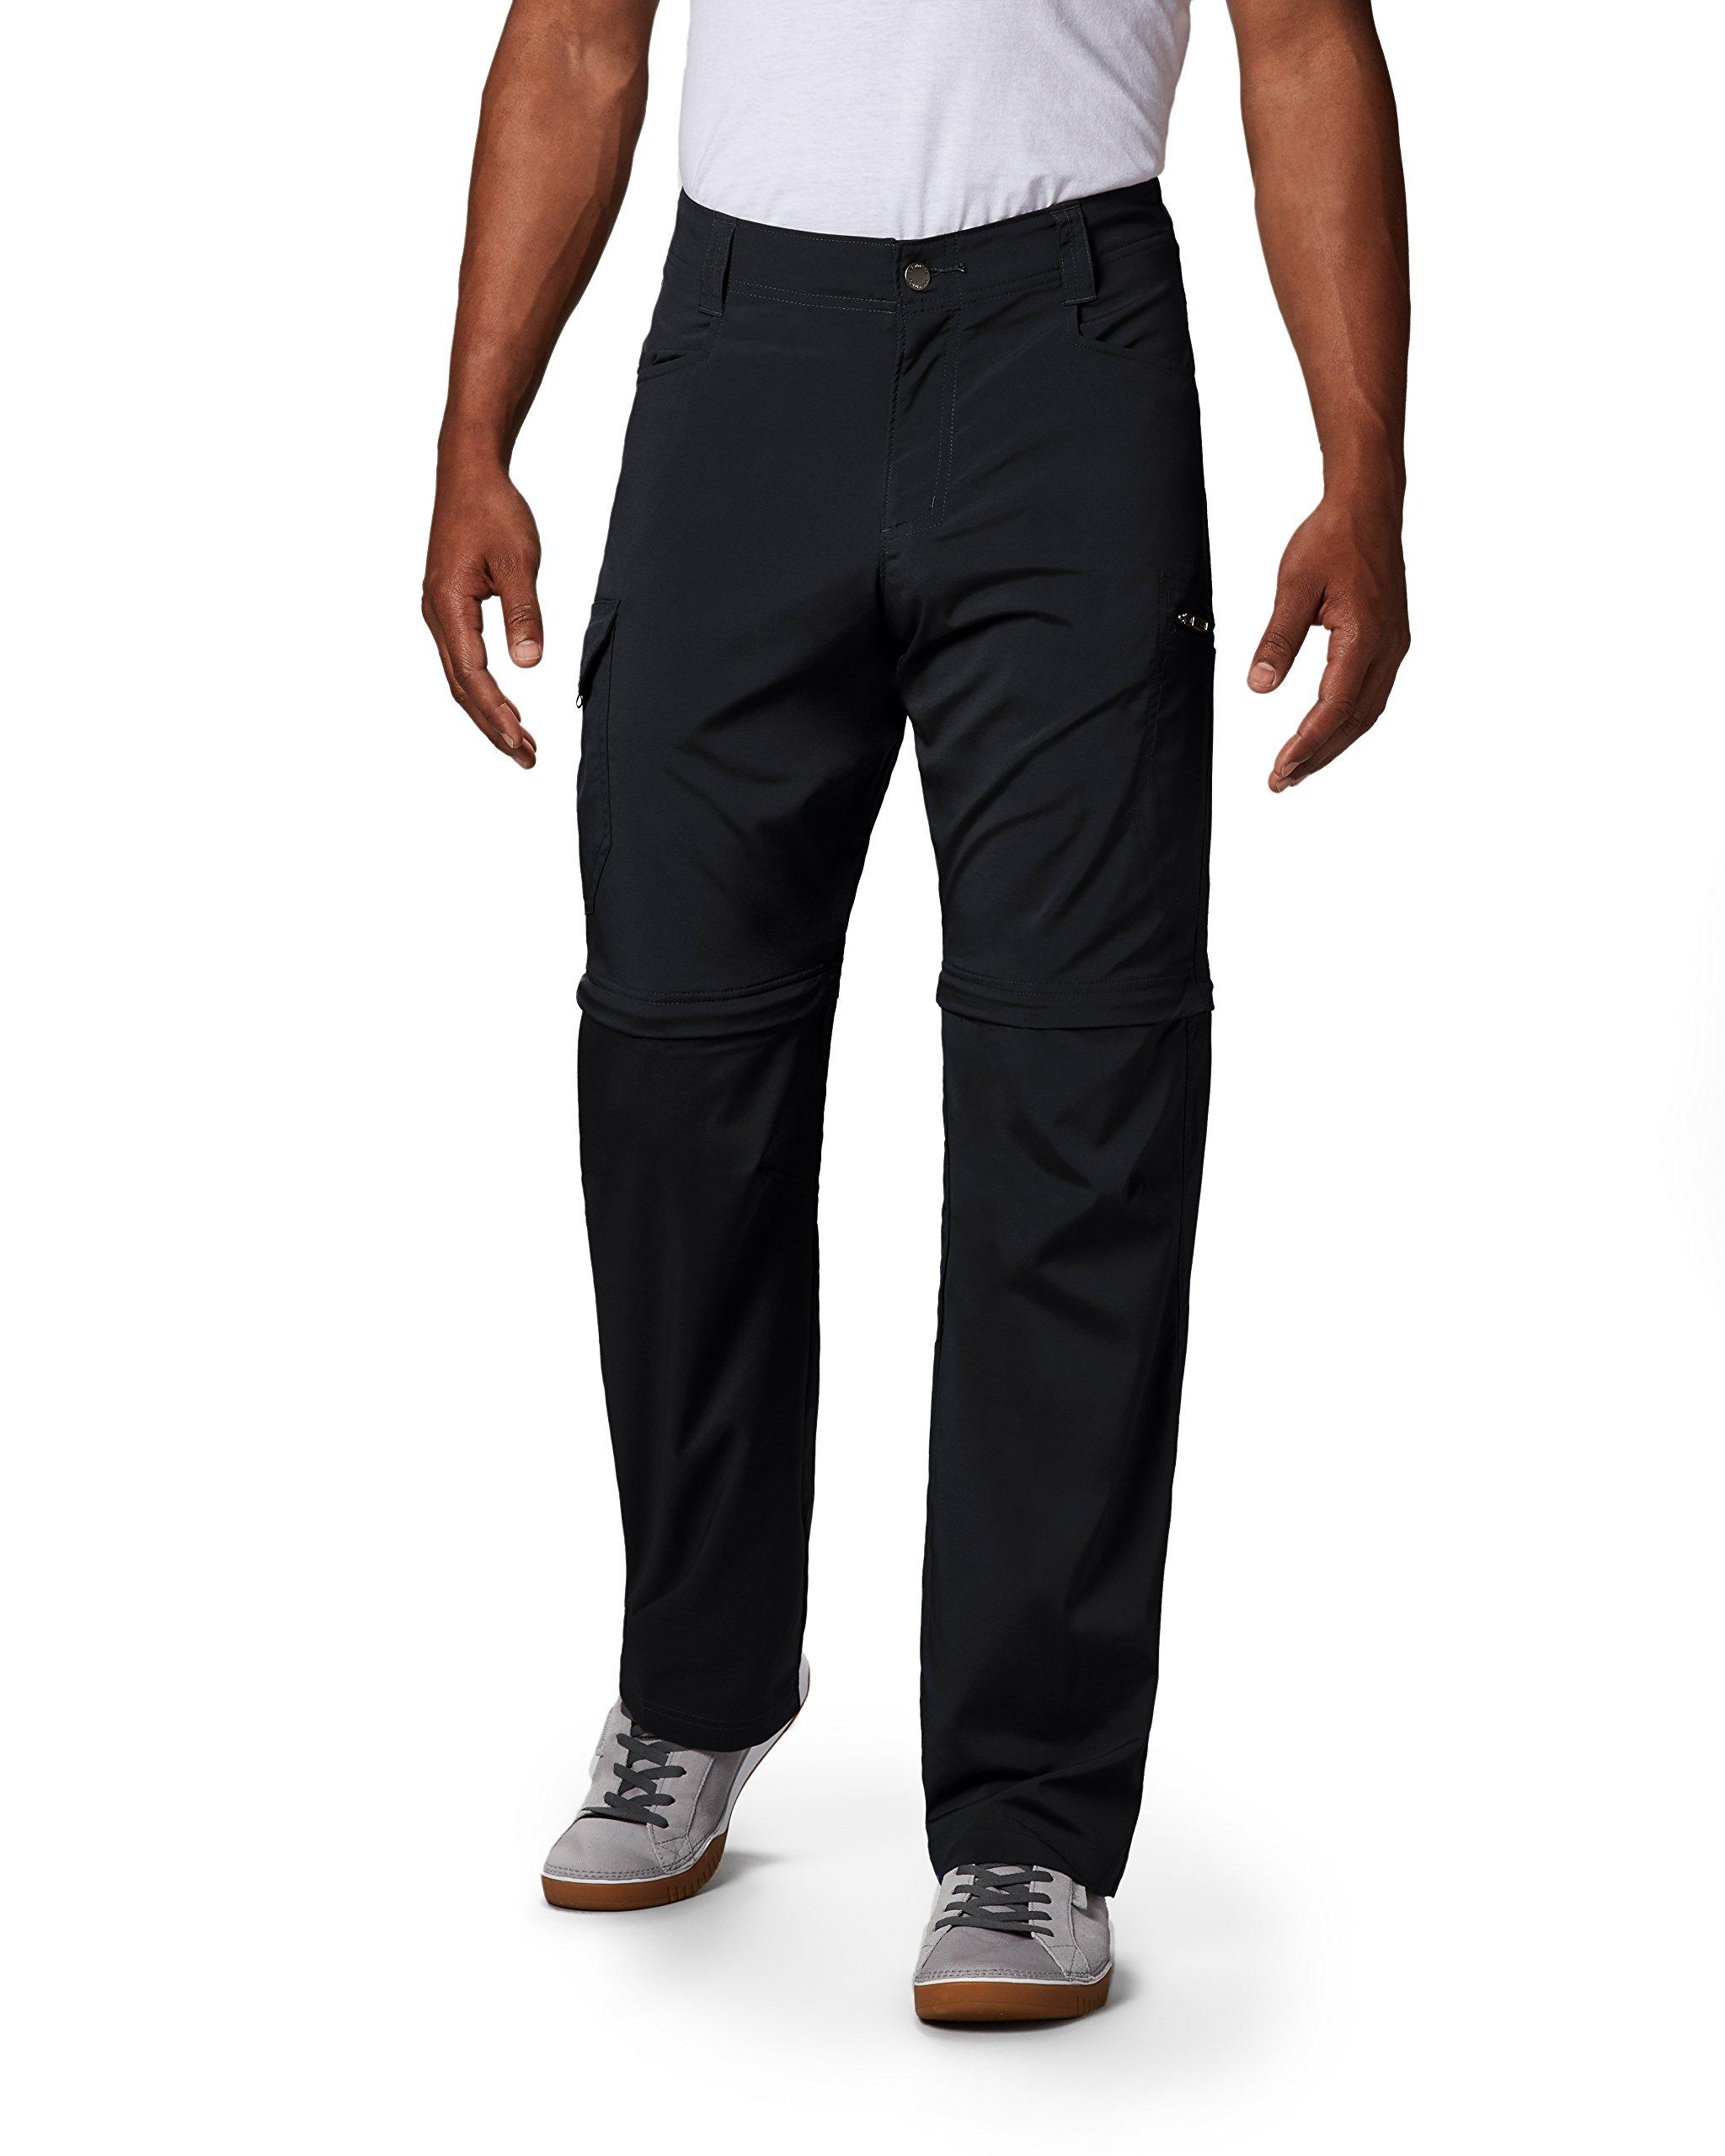 Columbia Men's Standard Silver Ridge Stretch Convertible Pant, Black, 32 x 32 by Columbia